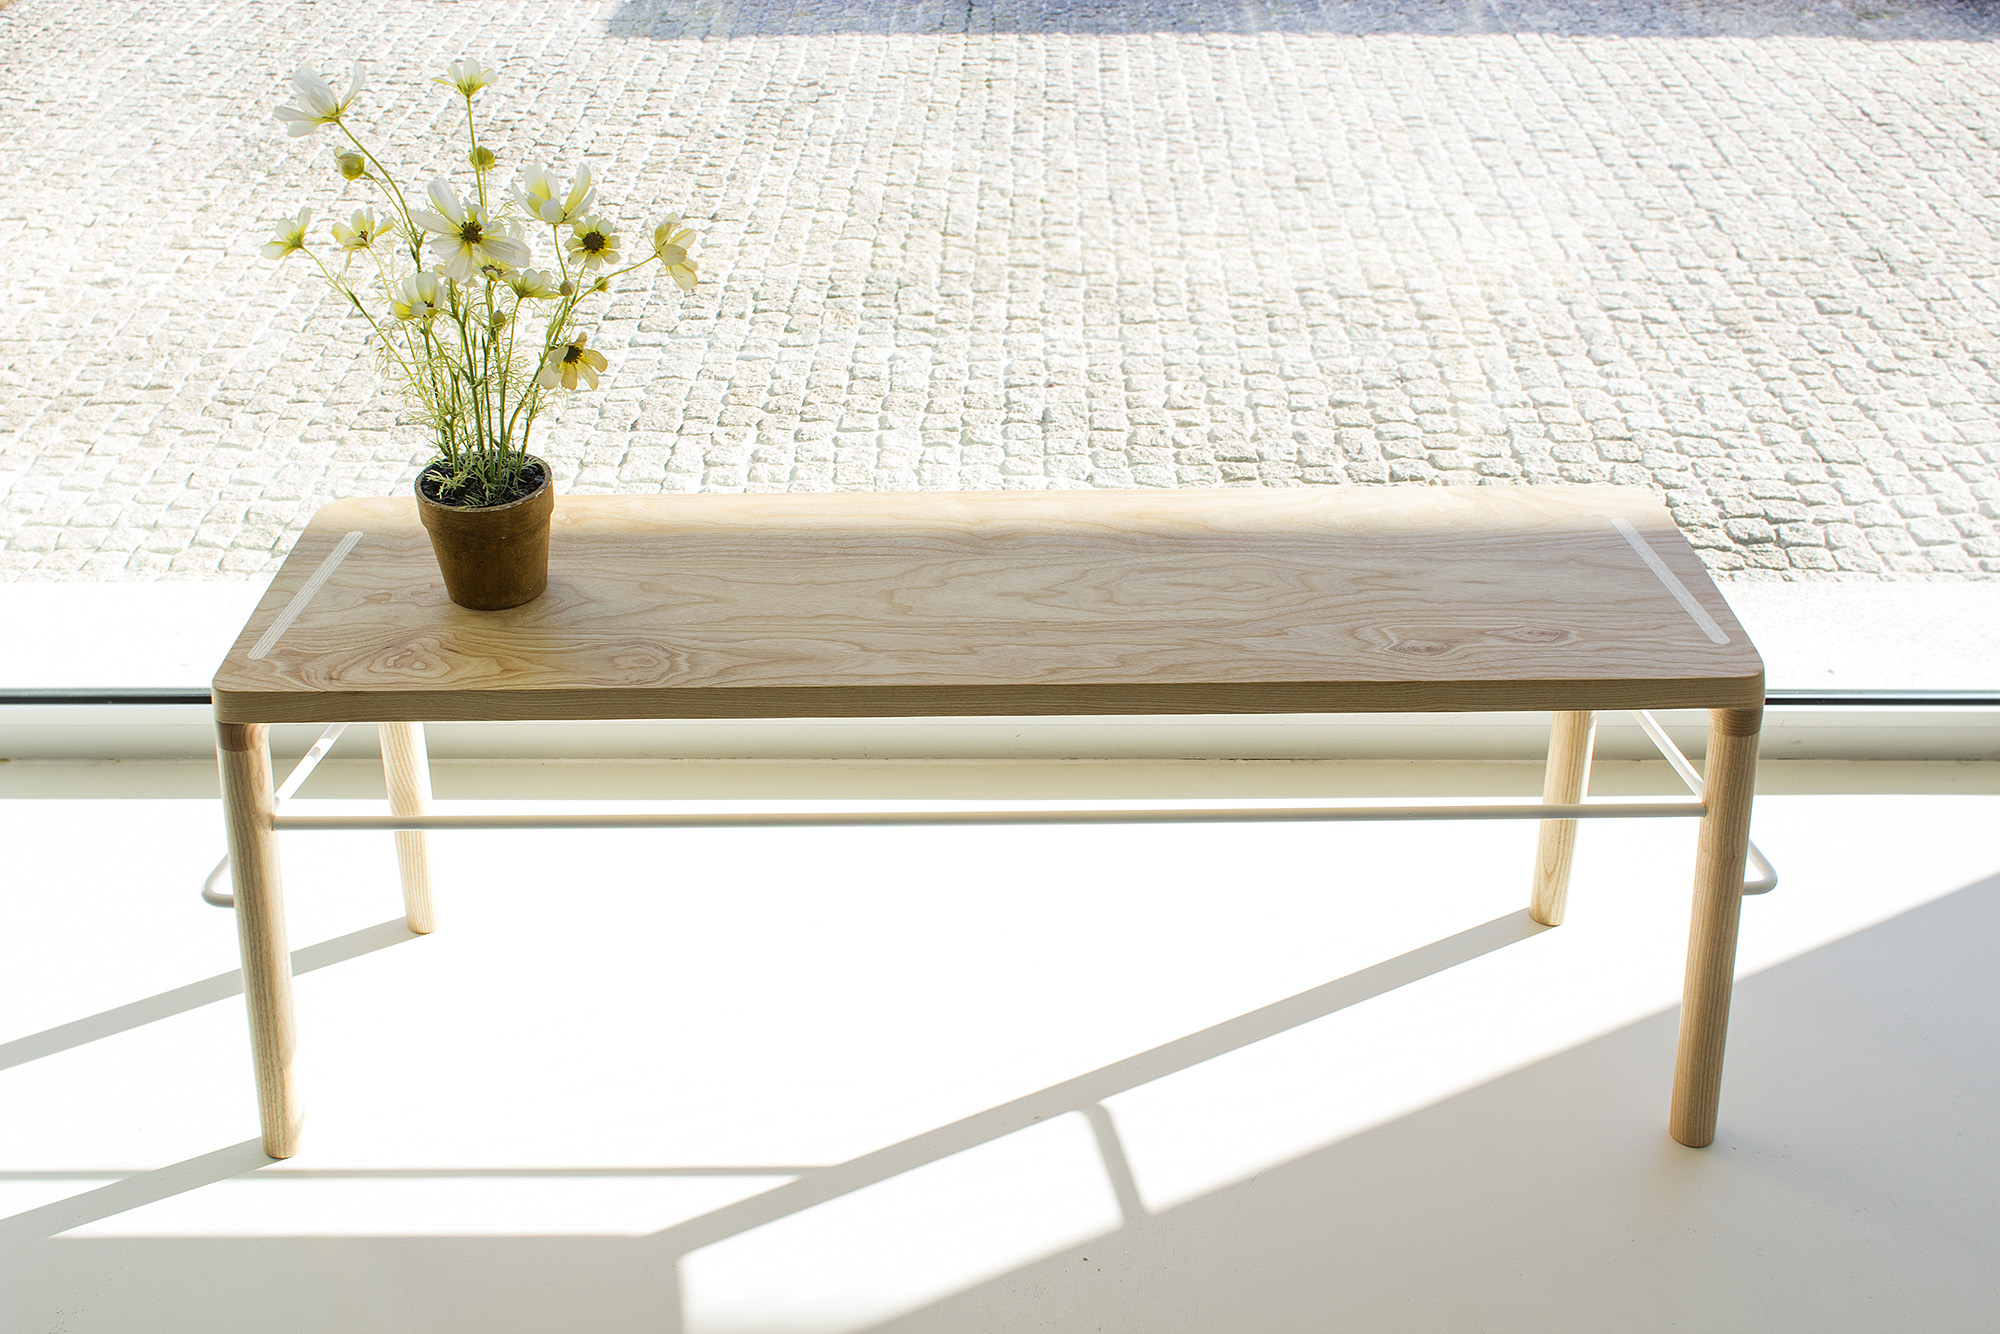 low-Galula-taberna-bench-amb-ash-white-1.jpg